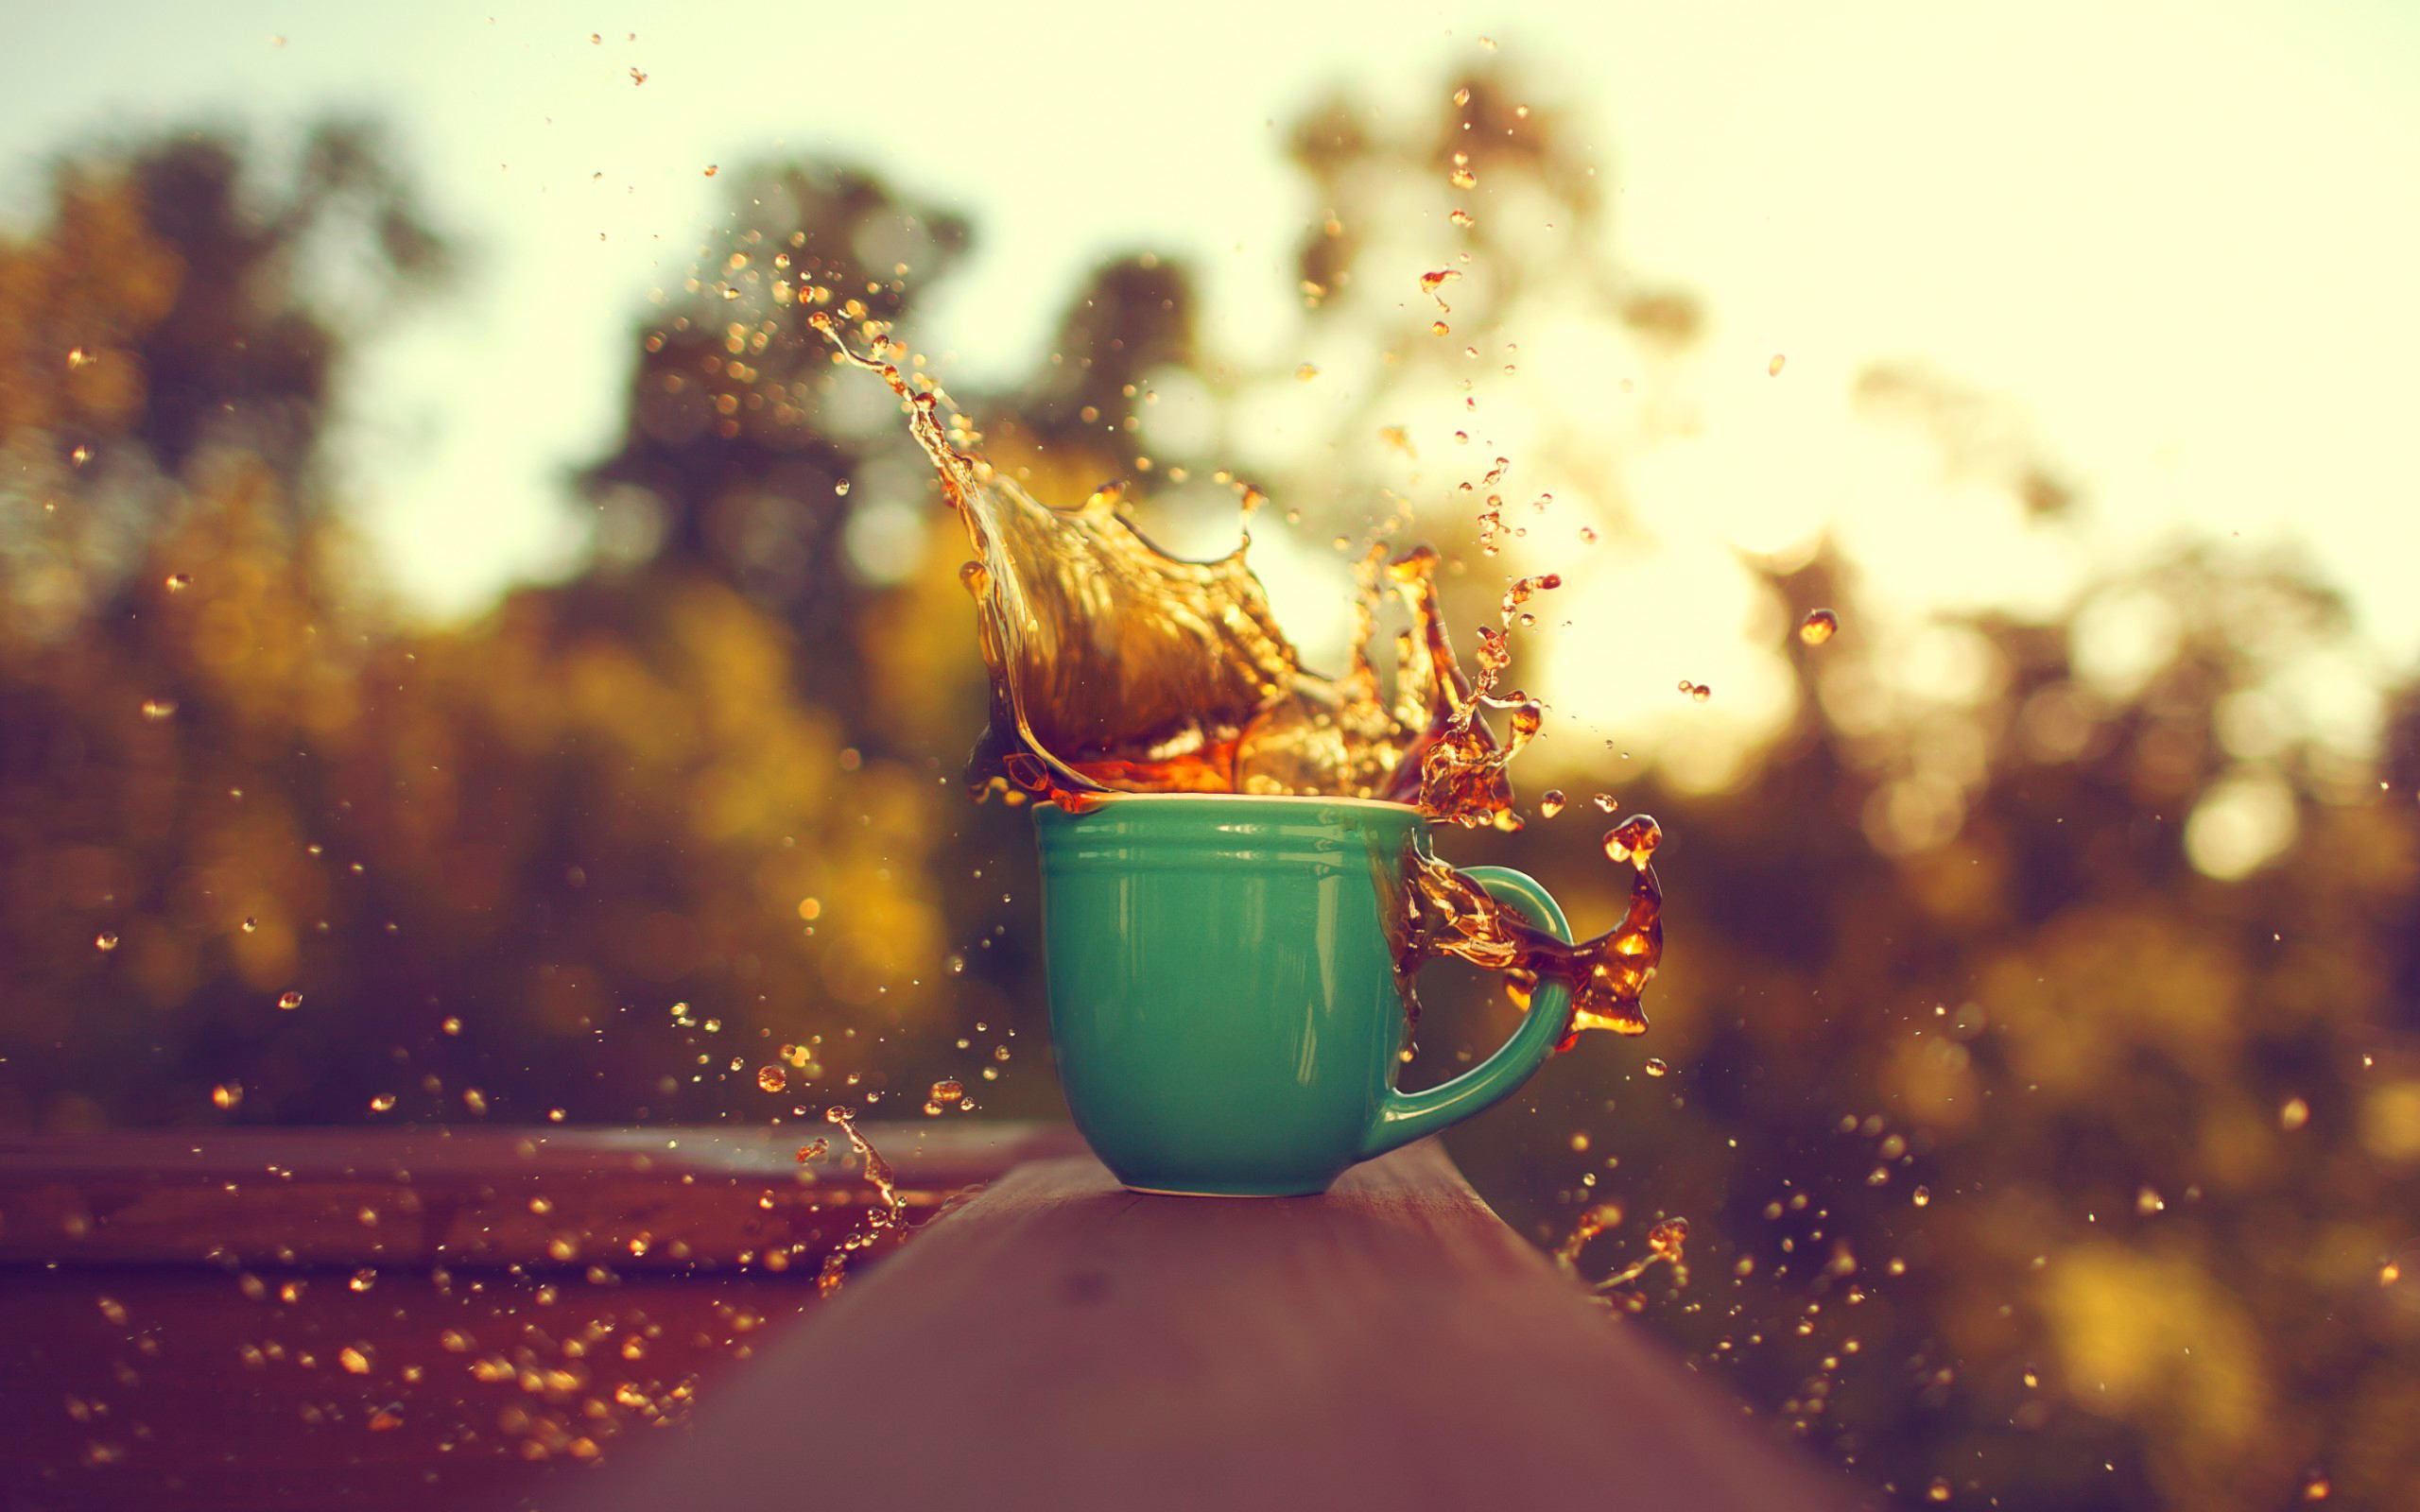 Cup splash